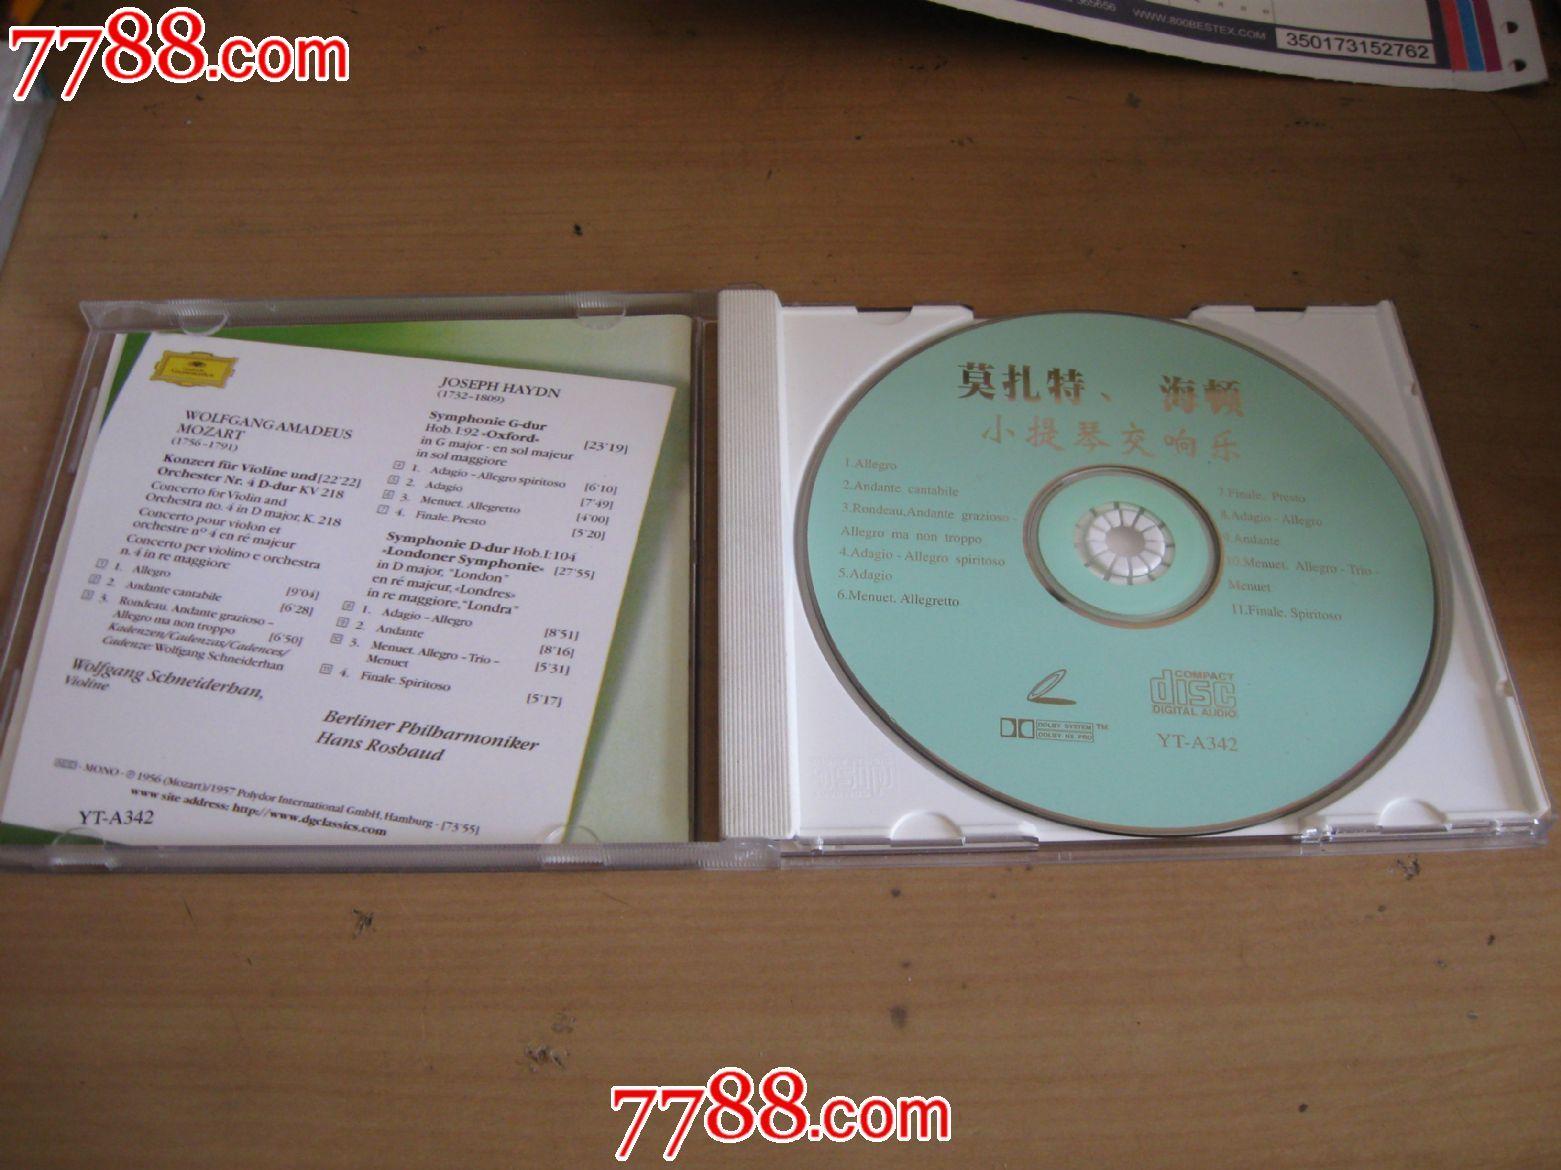 cd----莫扎特,海顿小提琴交响乐